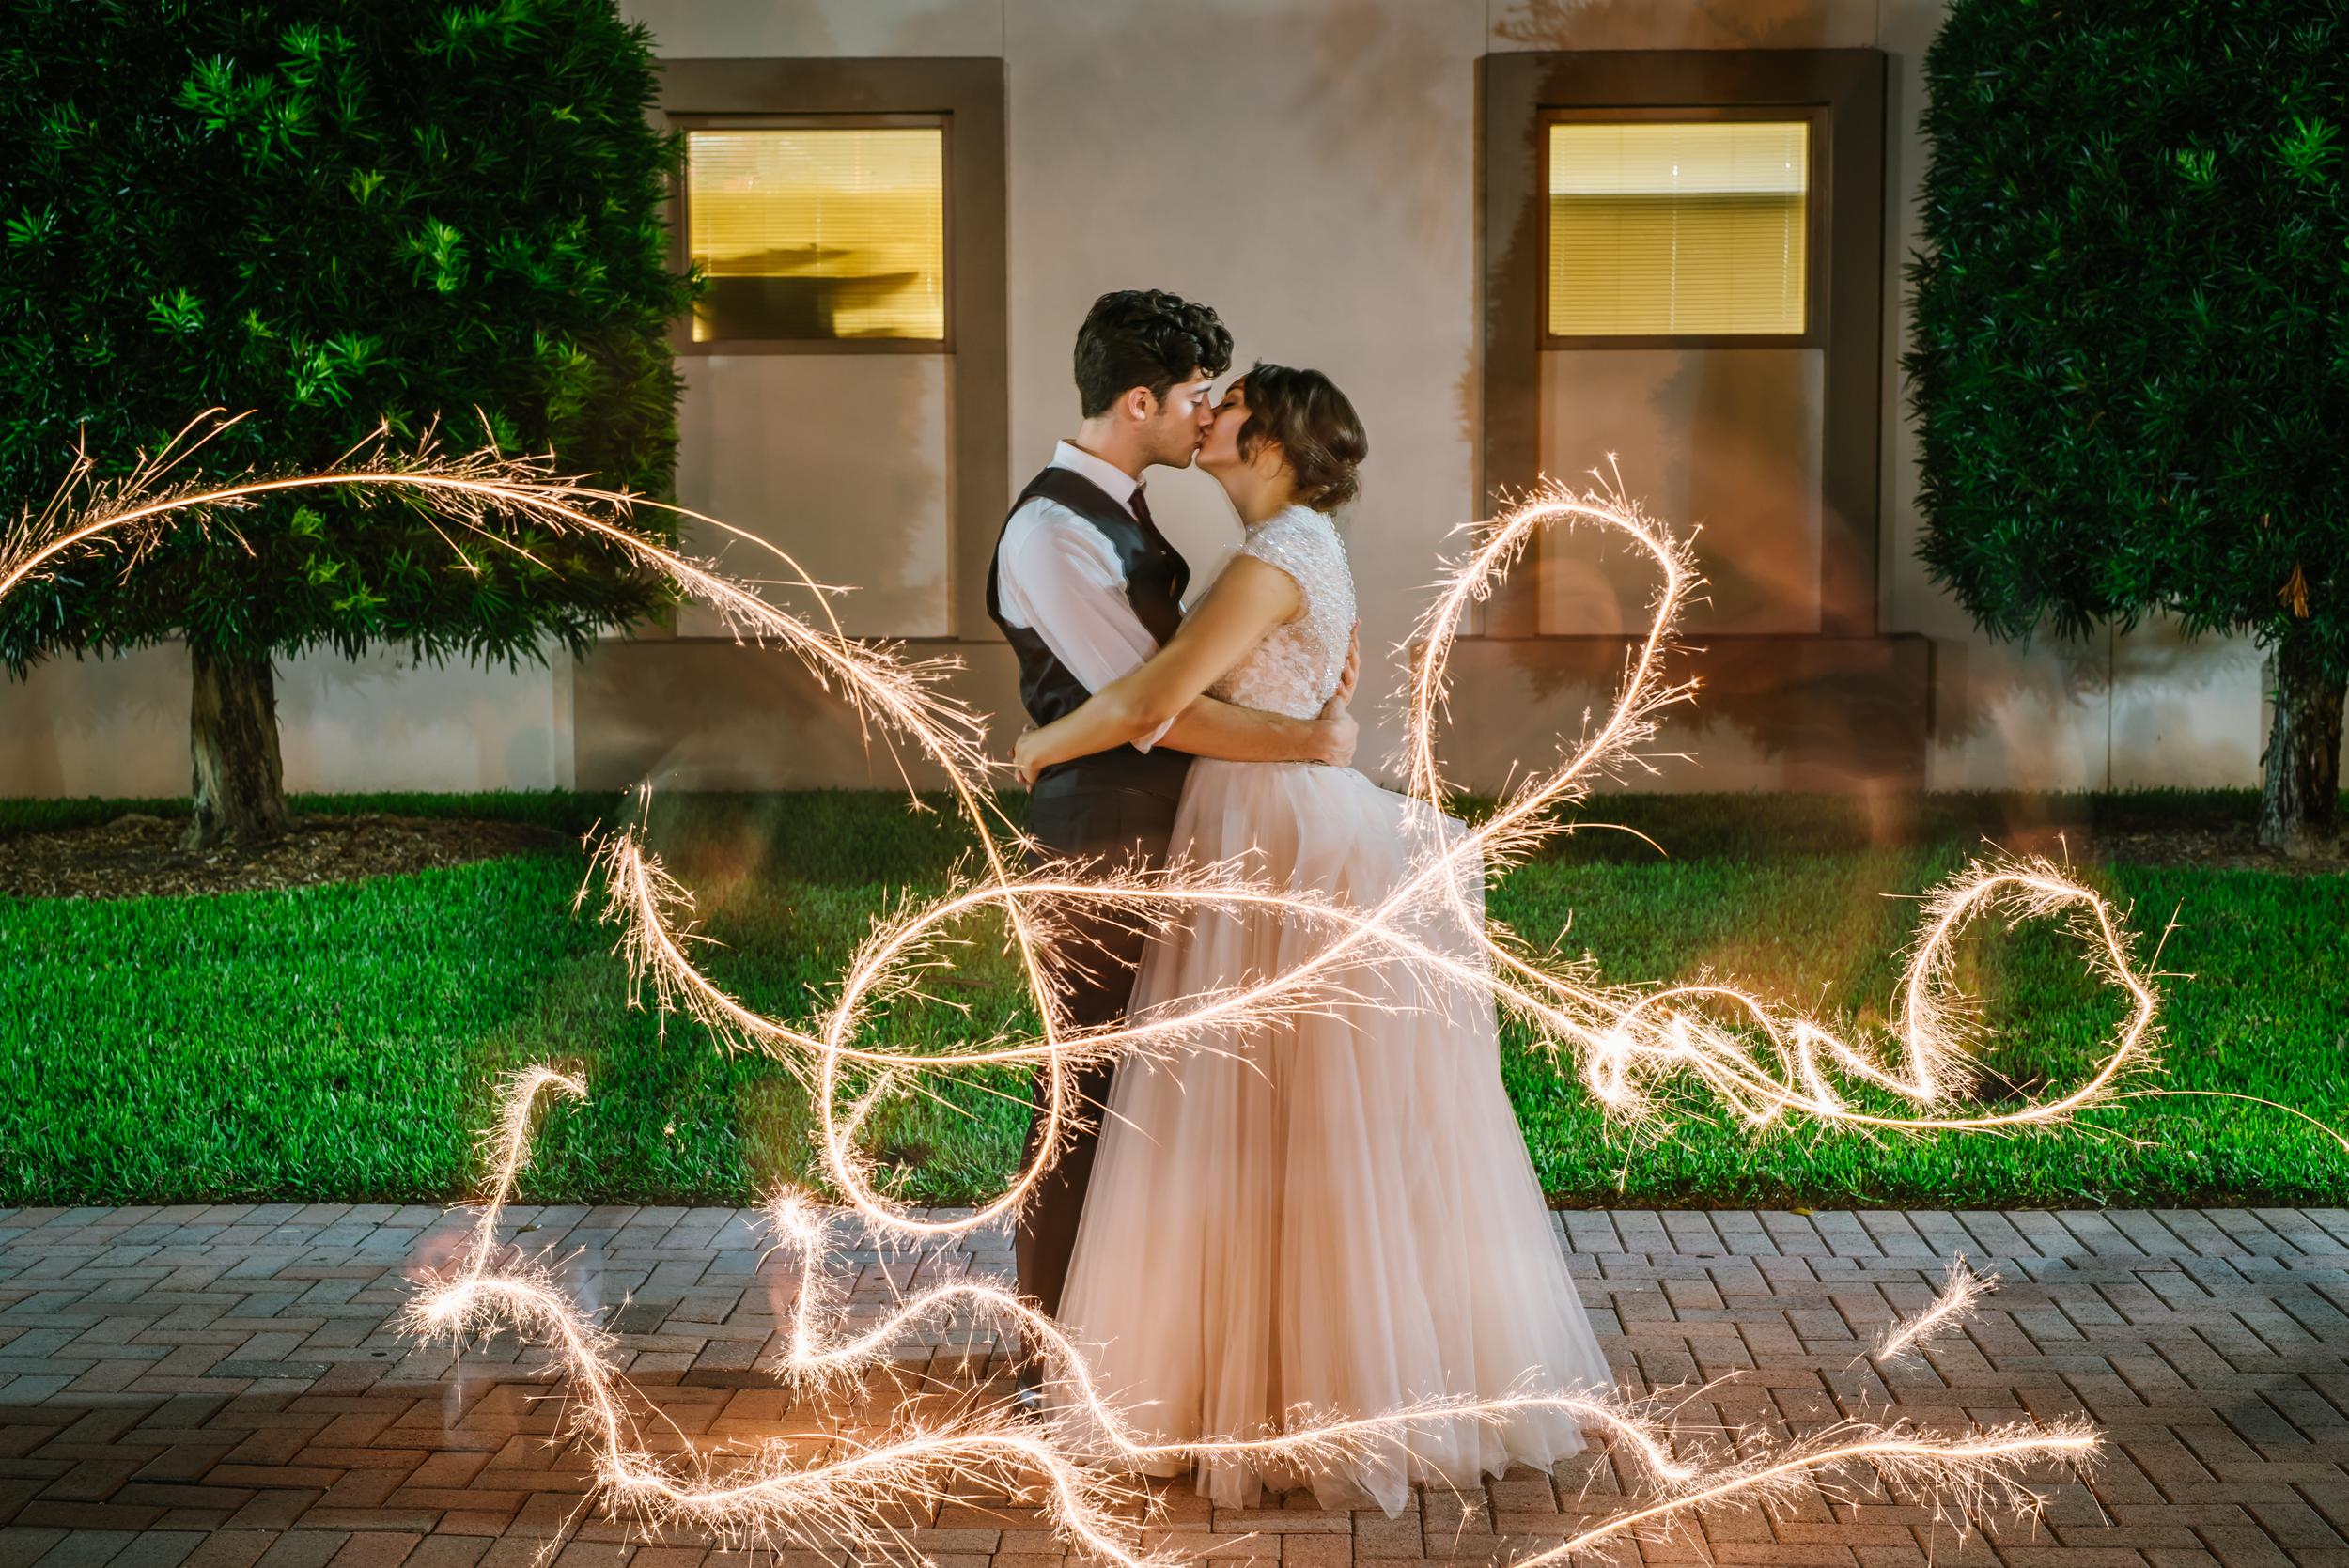 tampa-wedding-photographer-south-florida-museum-sparklers-fun-romantic